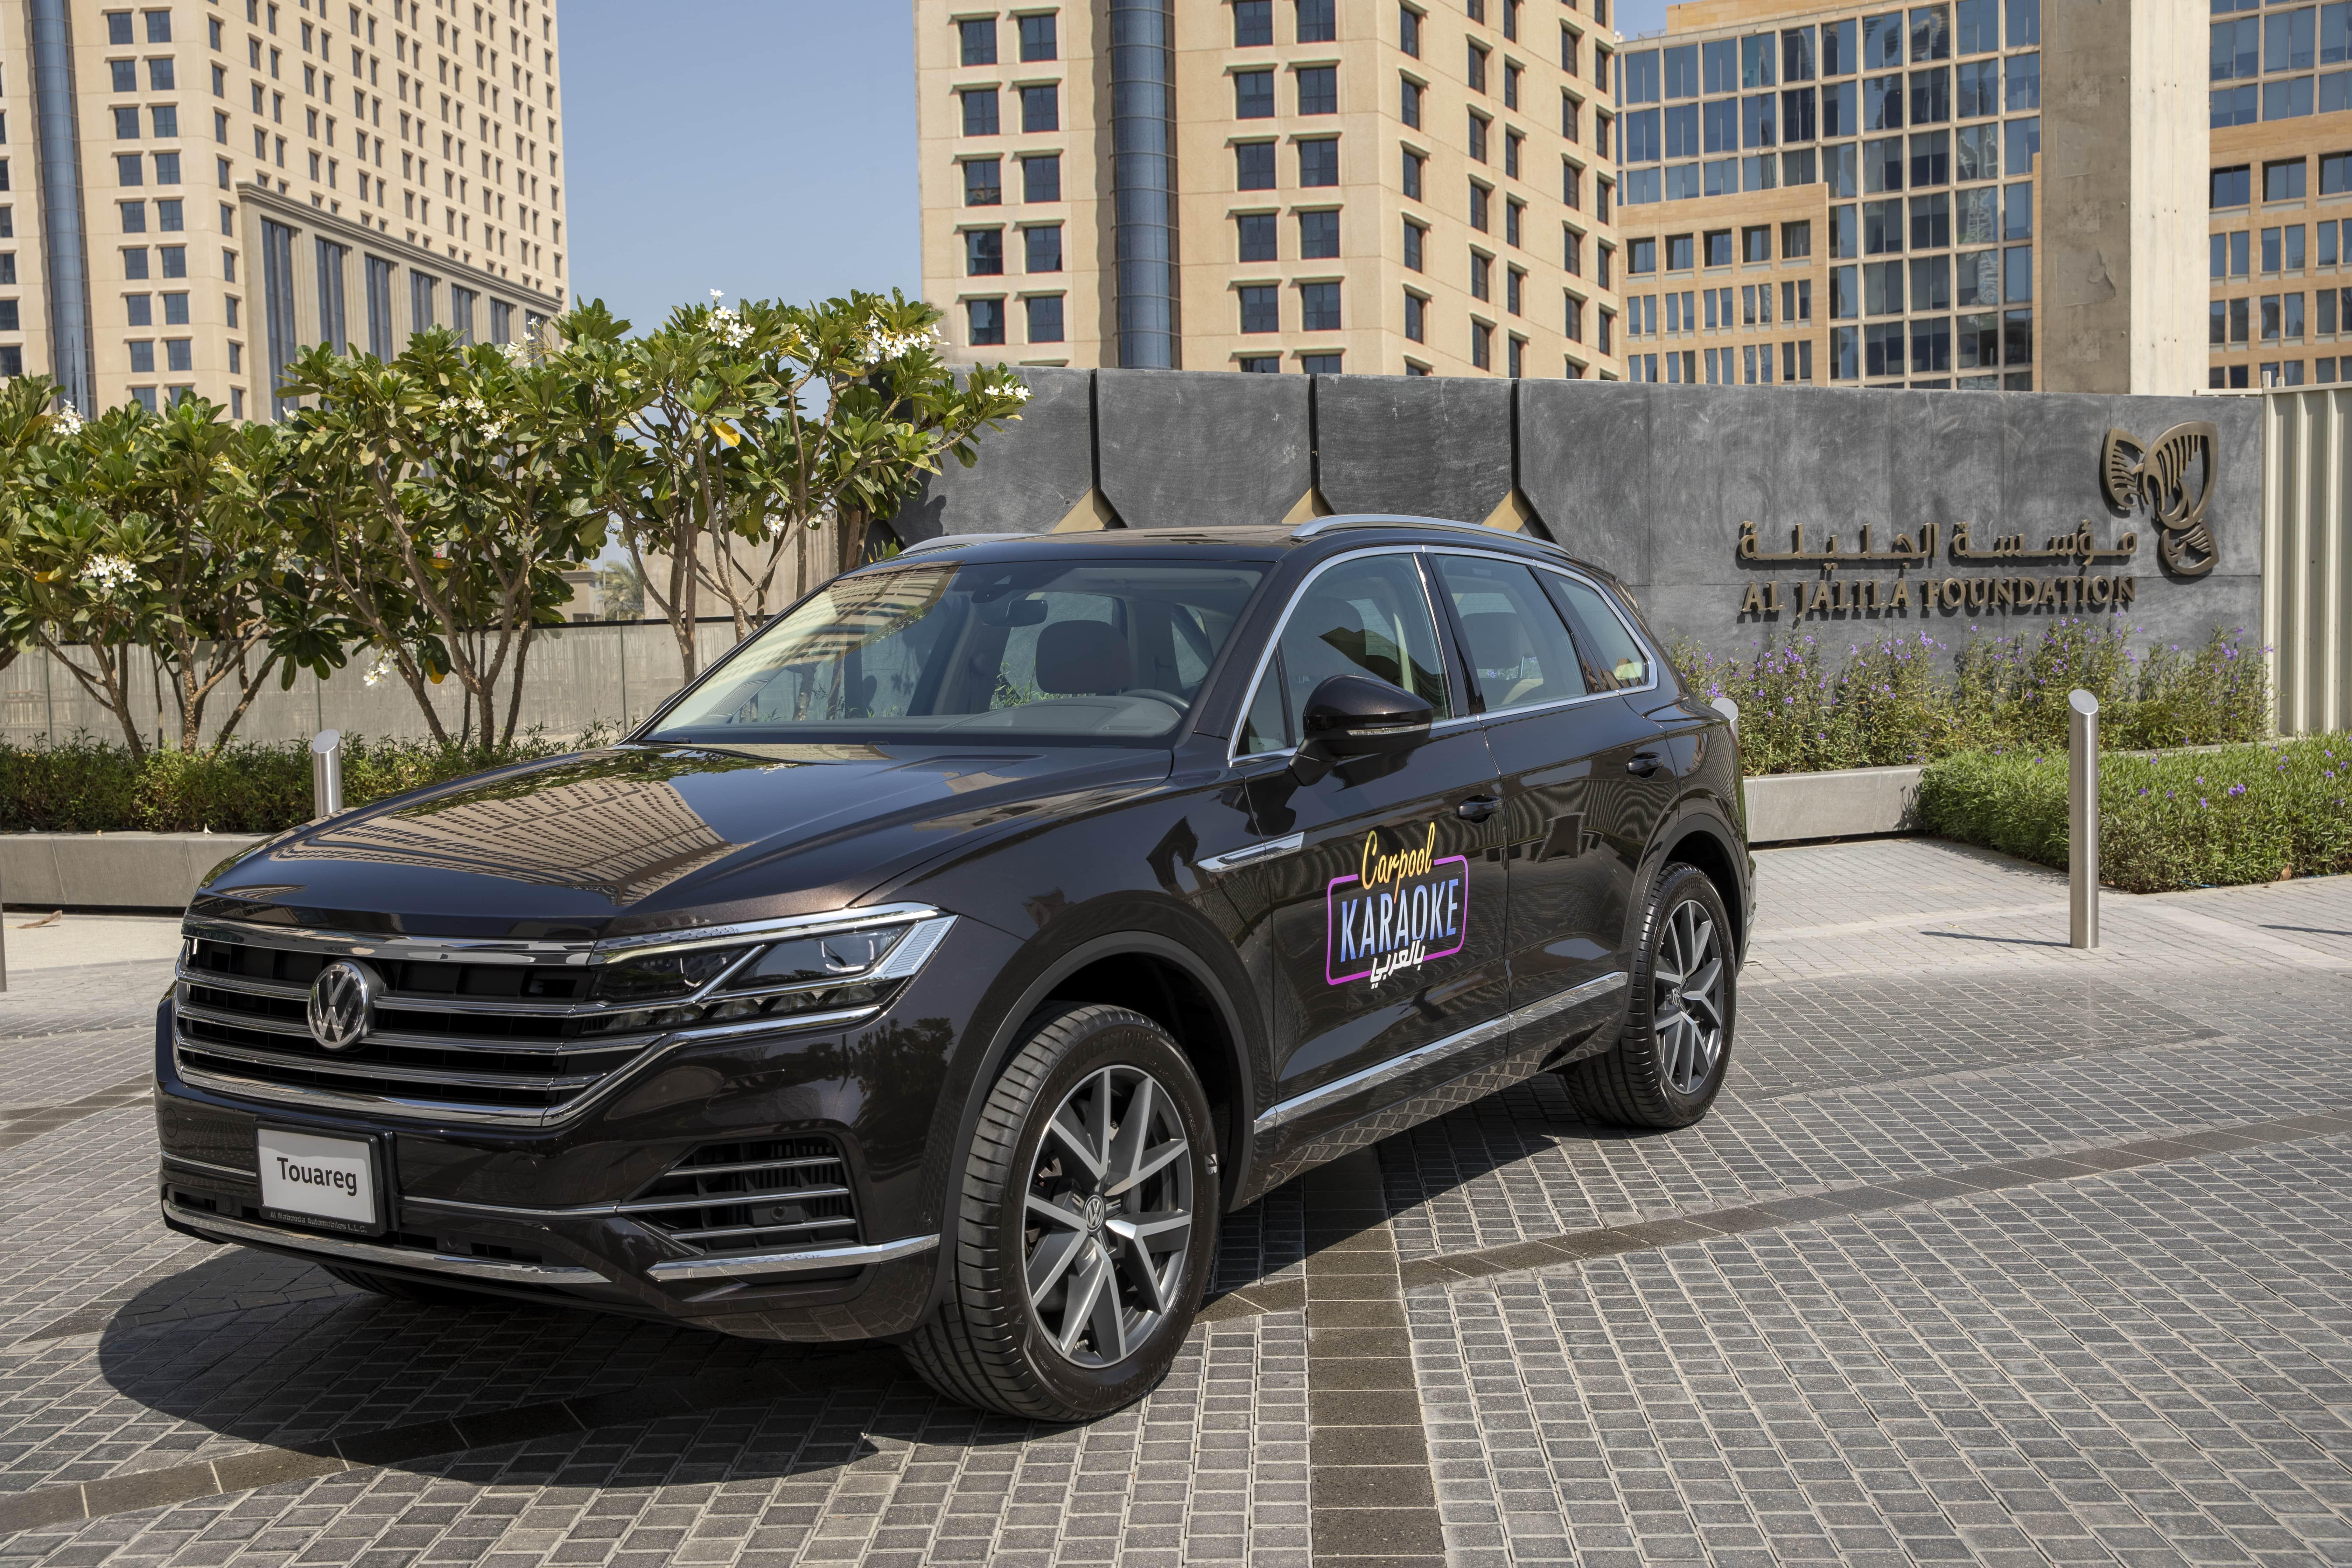 Al Nabooda Automobiles donates AED 235,000 to Al Jalila Foundation following auction of one-of-a-kind Carpool Karaoke Touareg